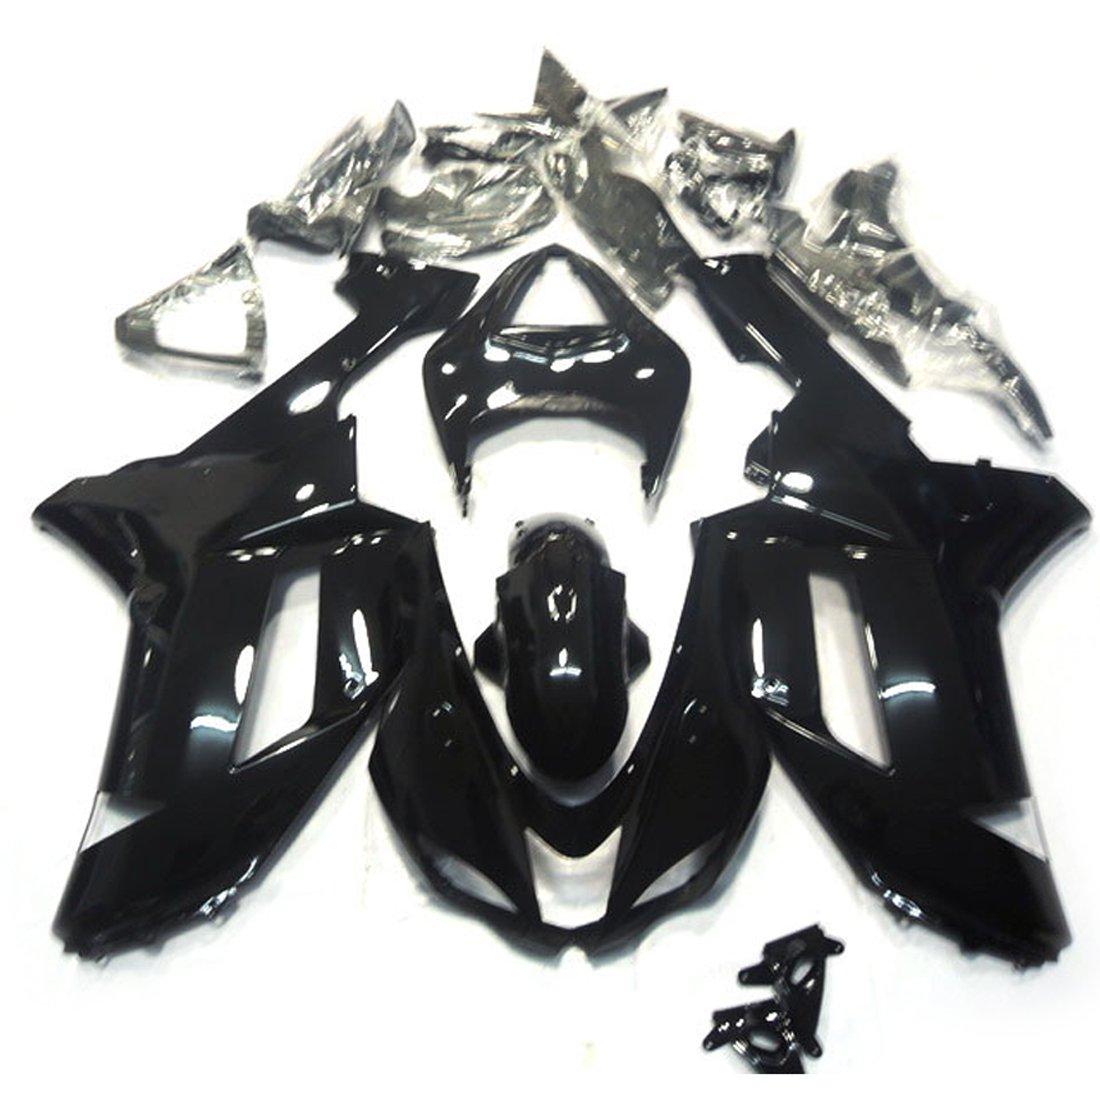 ZXMOTO K0607-BLK Motorcycle Bodywork Fairing Kit for Kawasaki Ninja ZX-6R ZX 600P 2007-2008 Gloss Black - (Pieces/kit: 24)